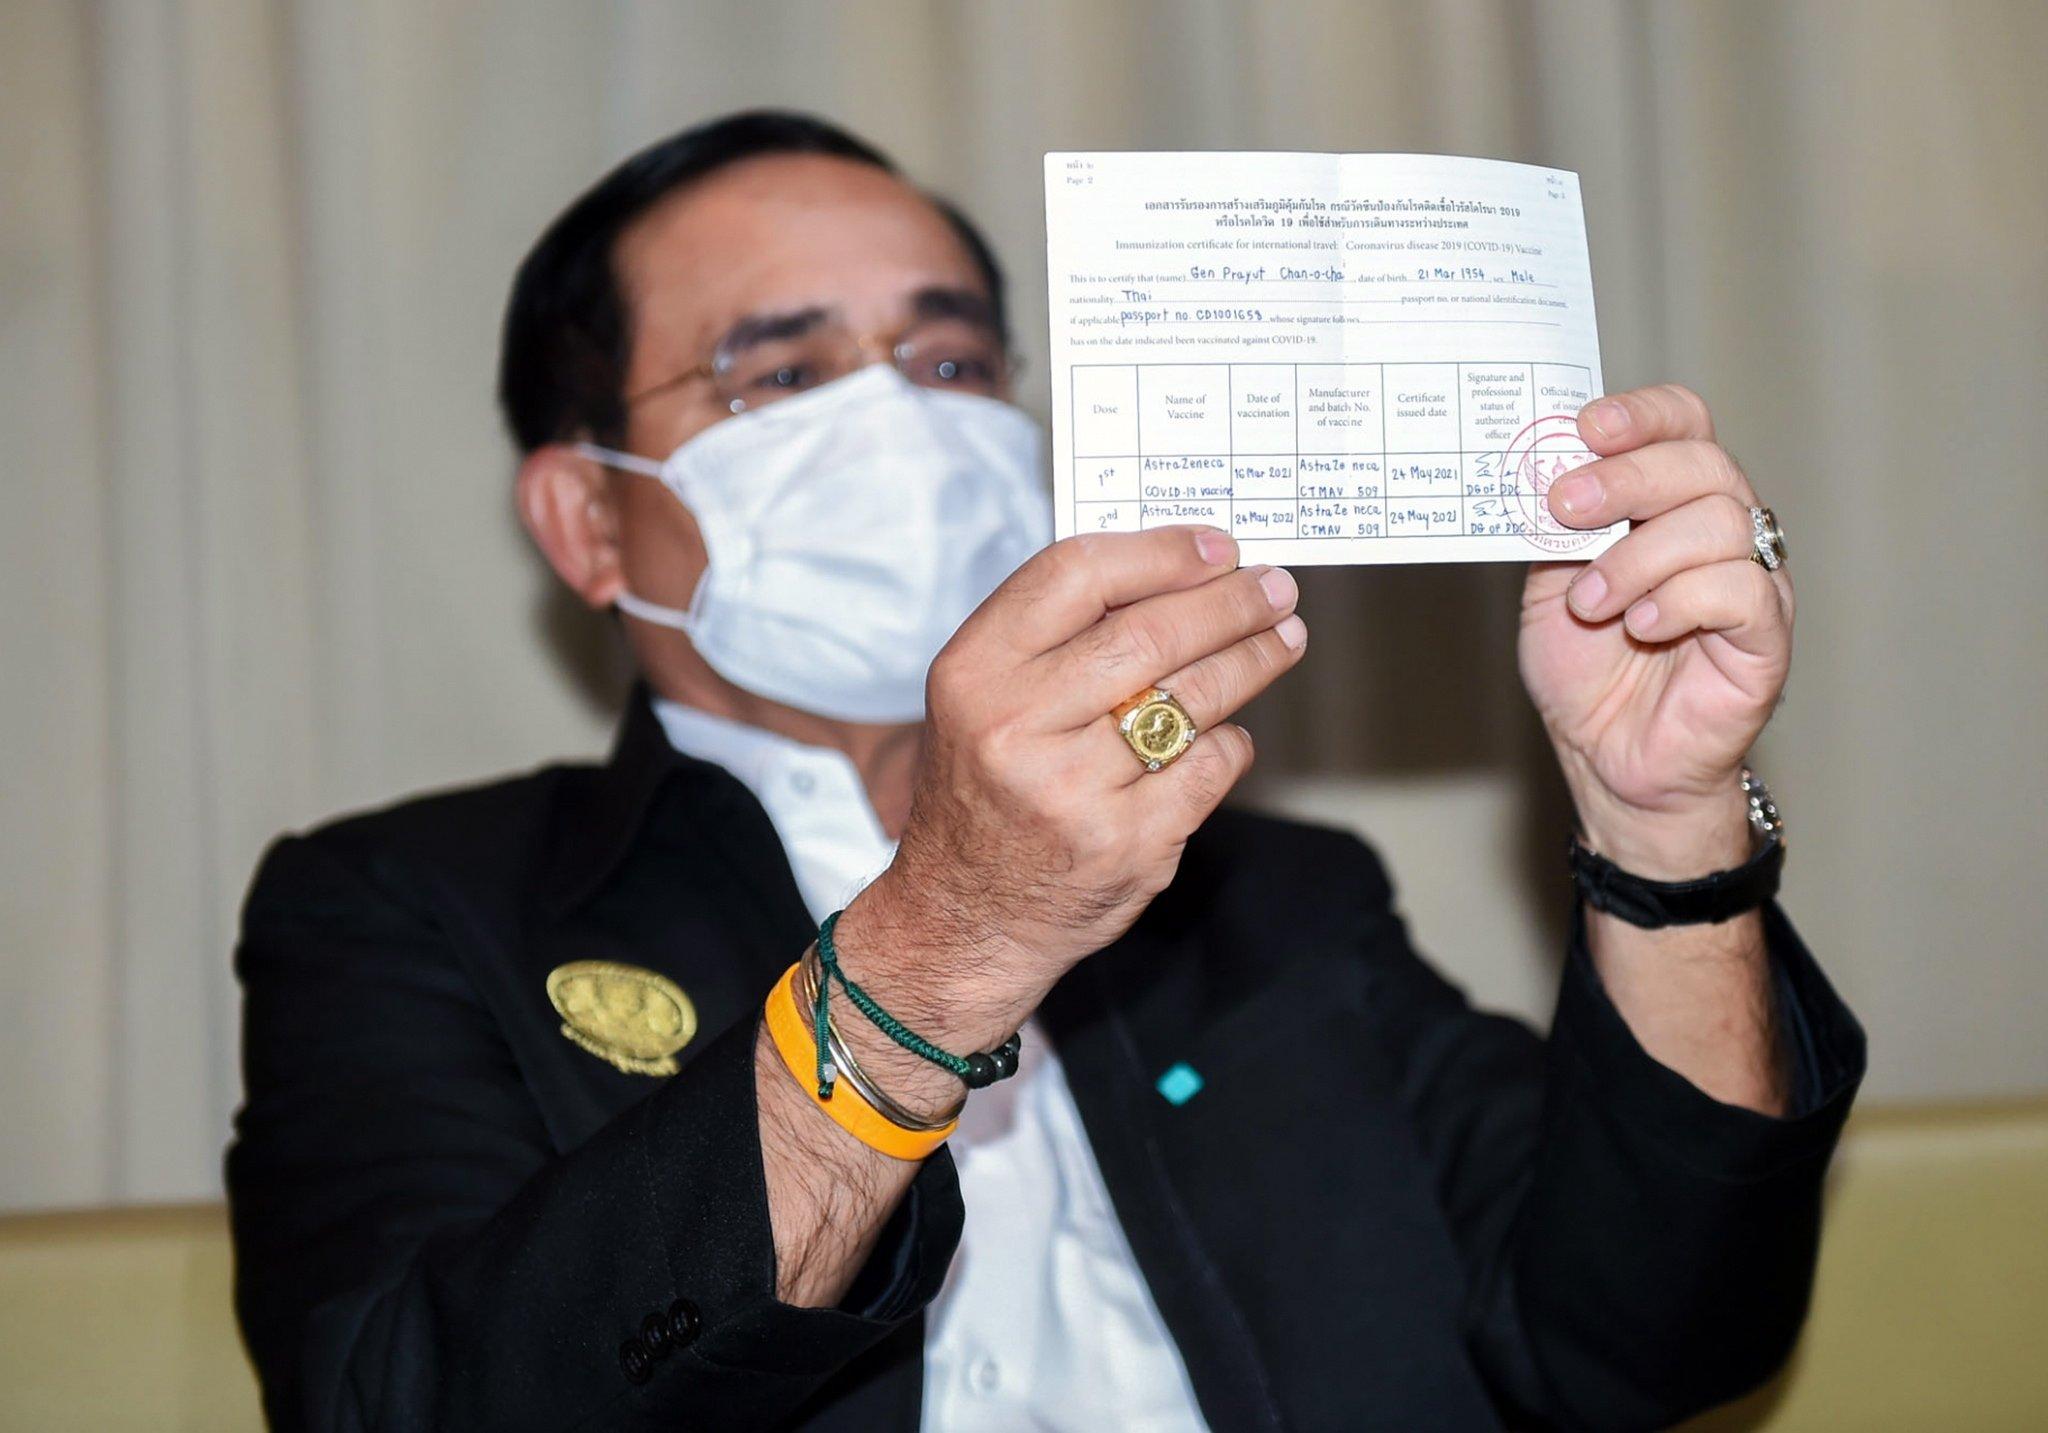 Thai Prime Minister Prayuth Chan-ocha displays his vaccine passport at the Bamrasnaradura Infectious Diseases Institute in Nonthaburi province, Thailand, May 24, 2021. (EPA Photo)